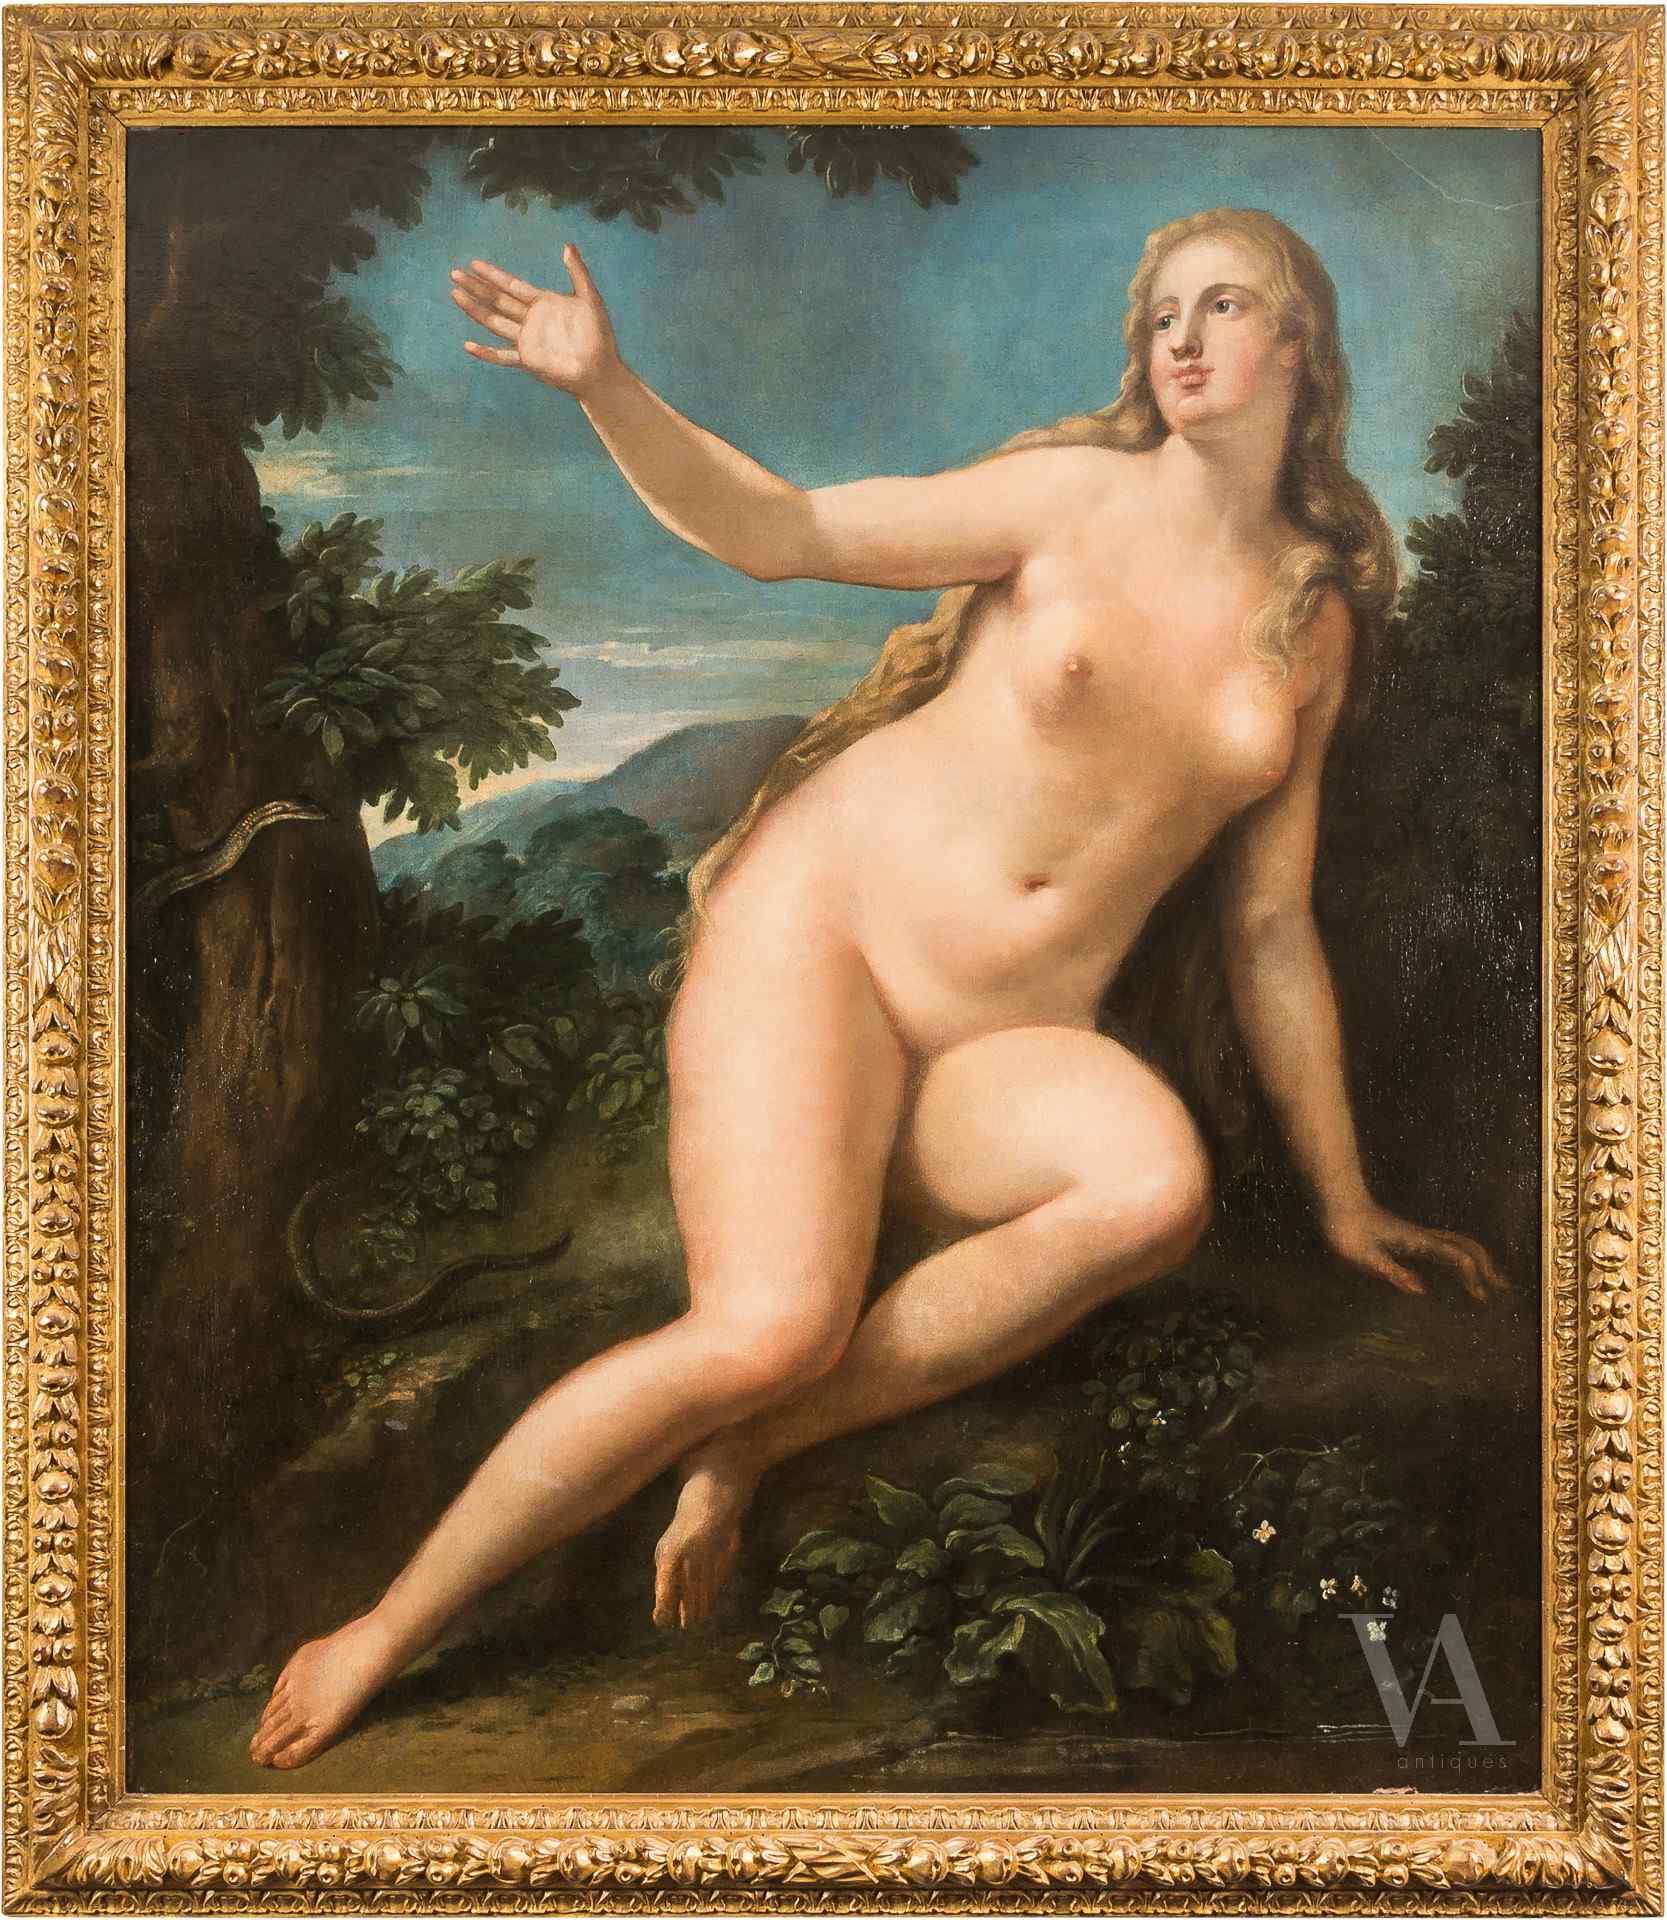 Niccolò Bambini, Eva nel Paradiso Terrestre